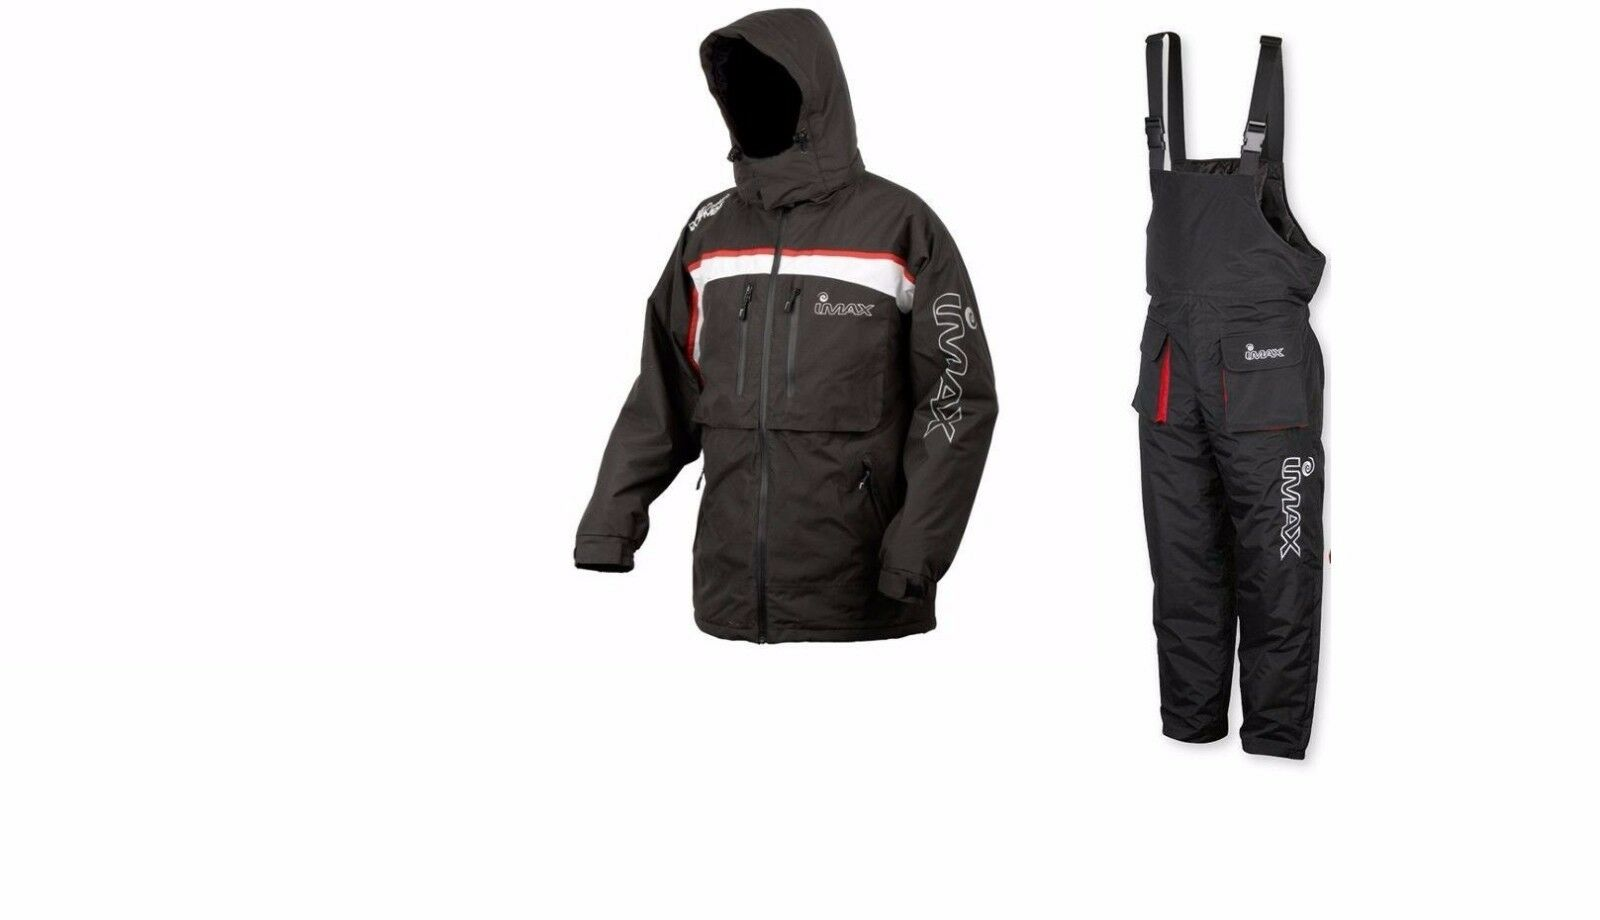 Imax Thermo jacket and Bib /& Brace set fishing hunting shooting waterproof warm